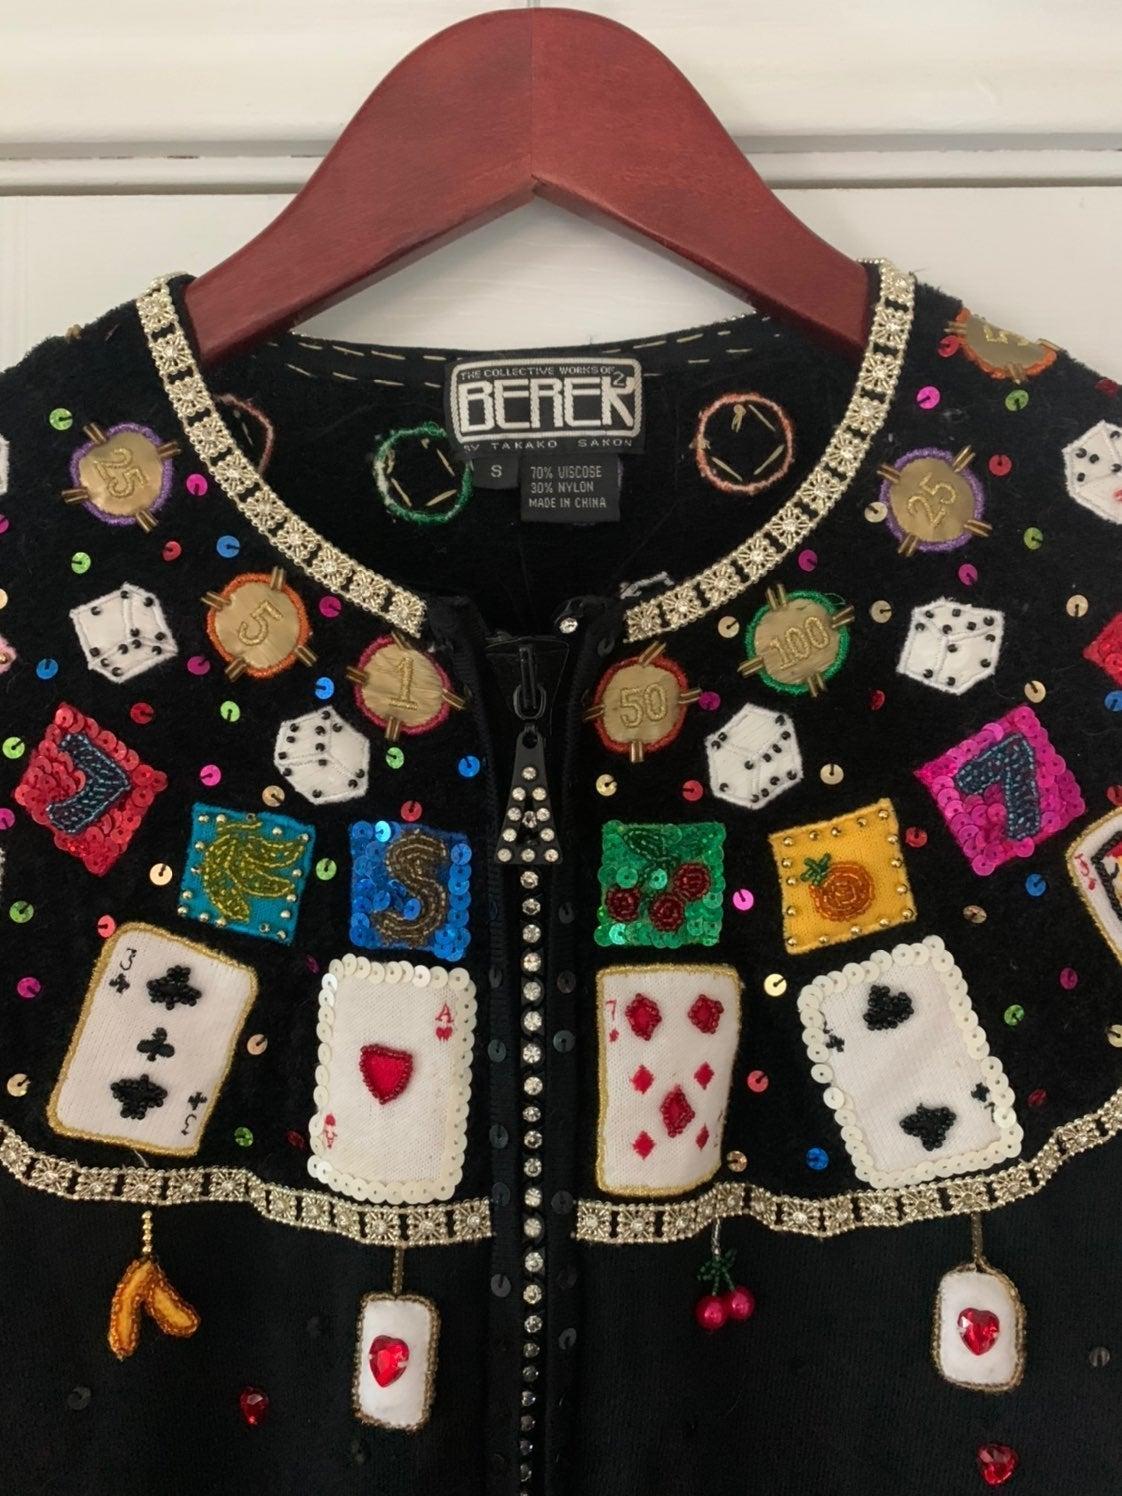 Vintage Berek Vegas Cardigan